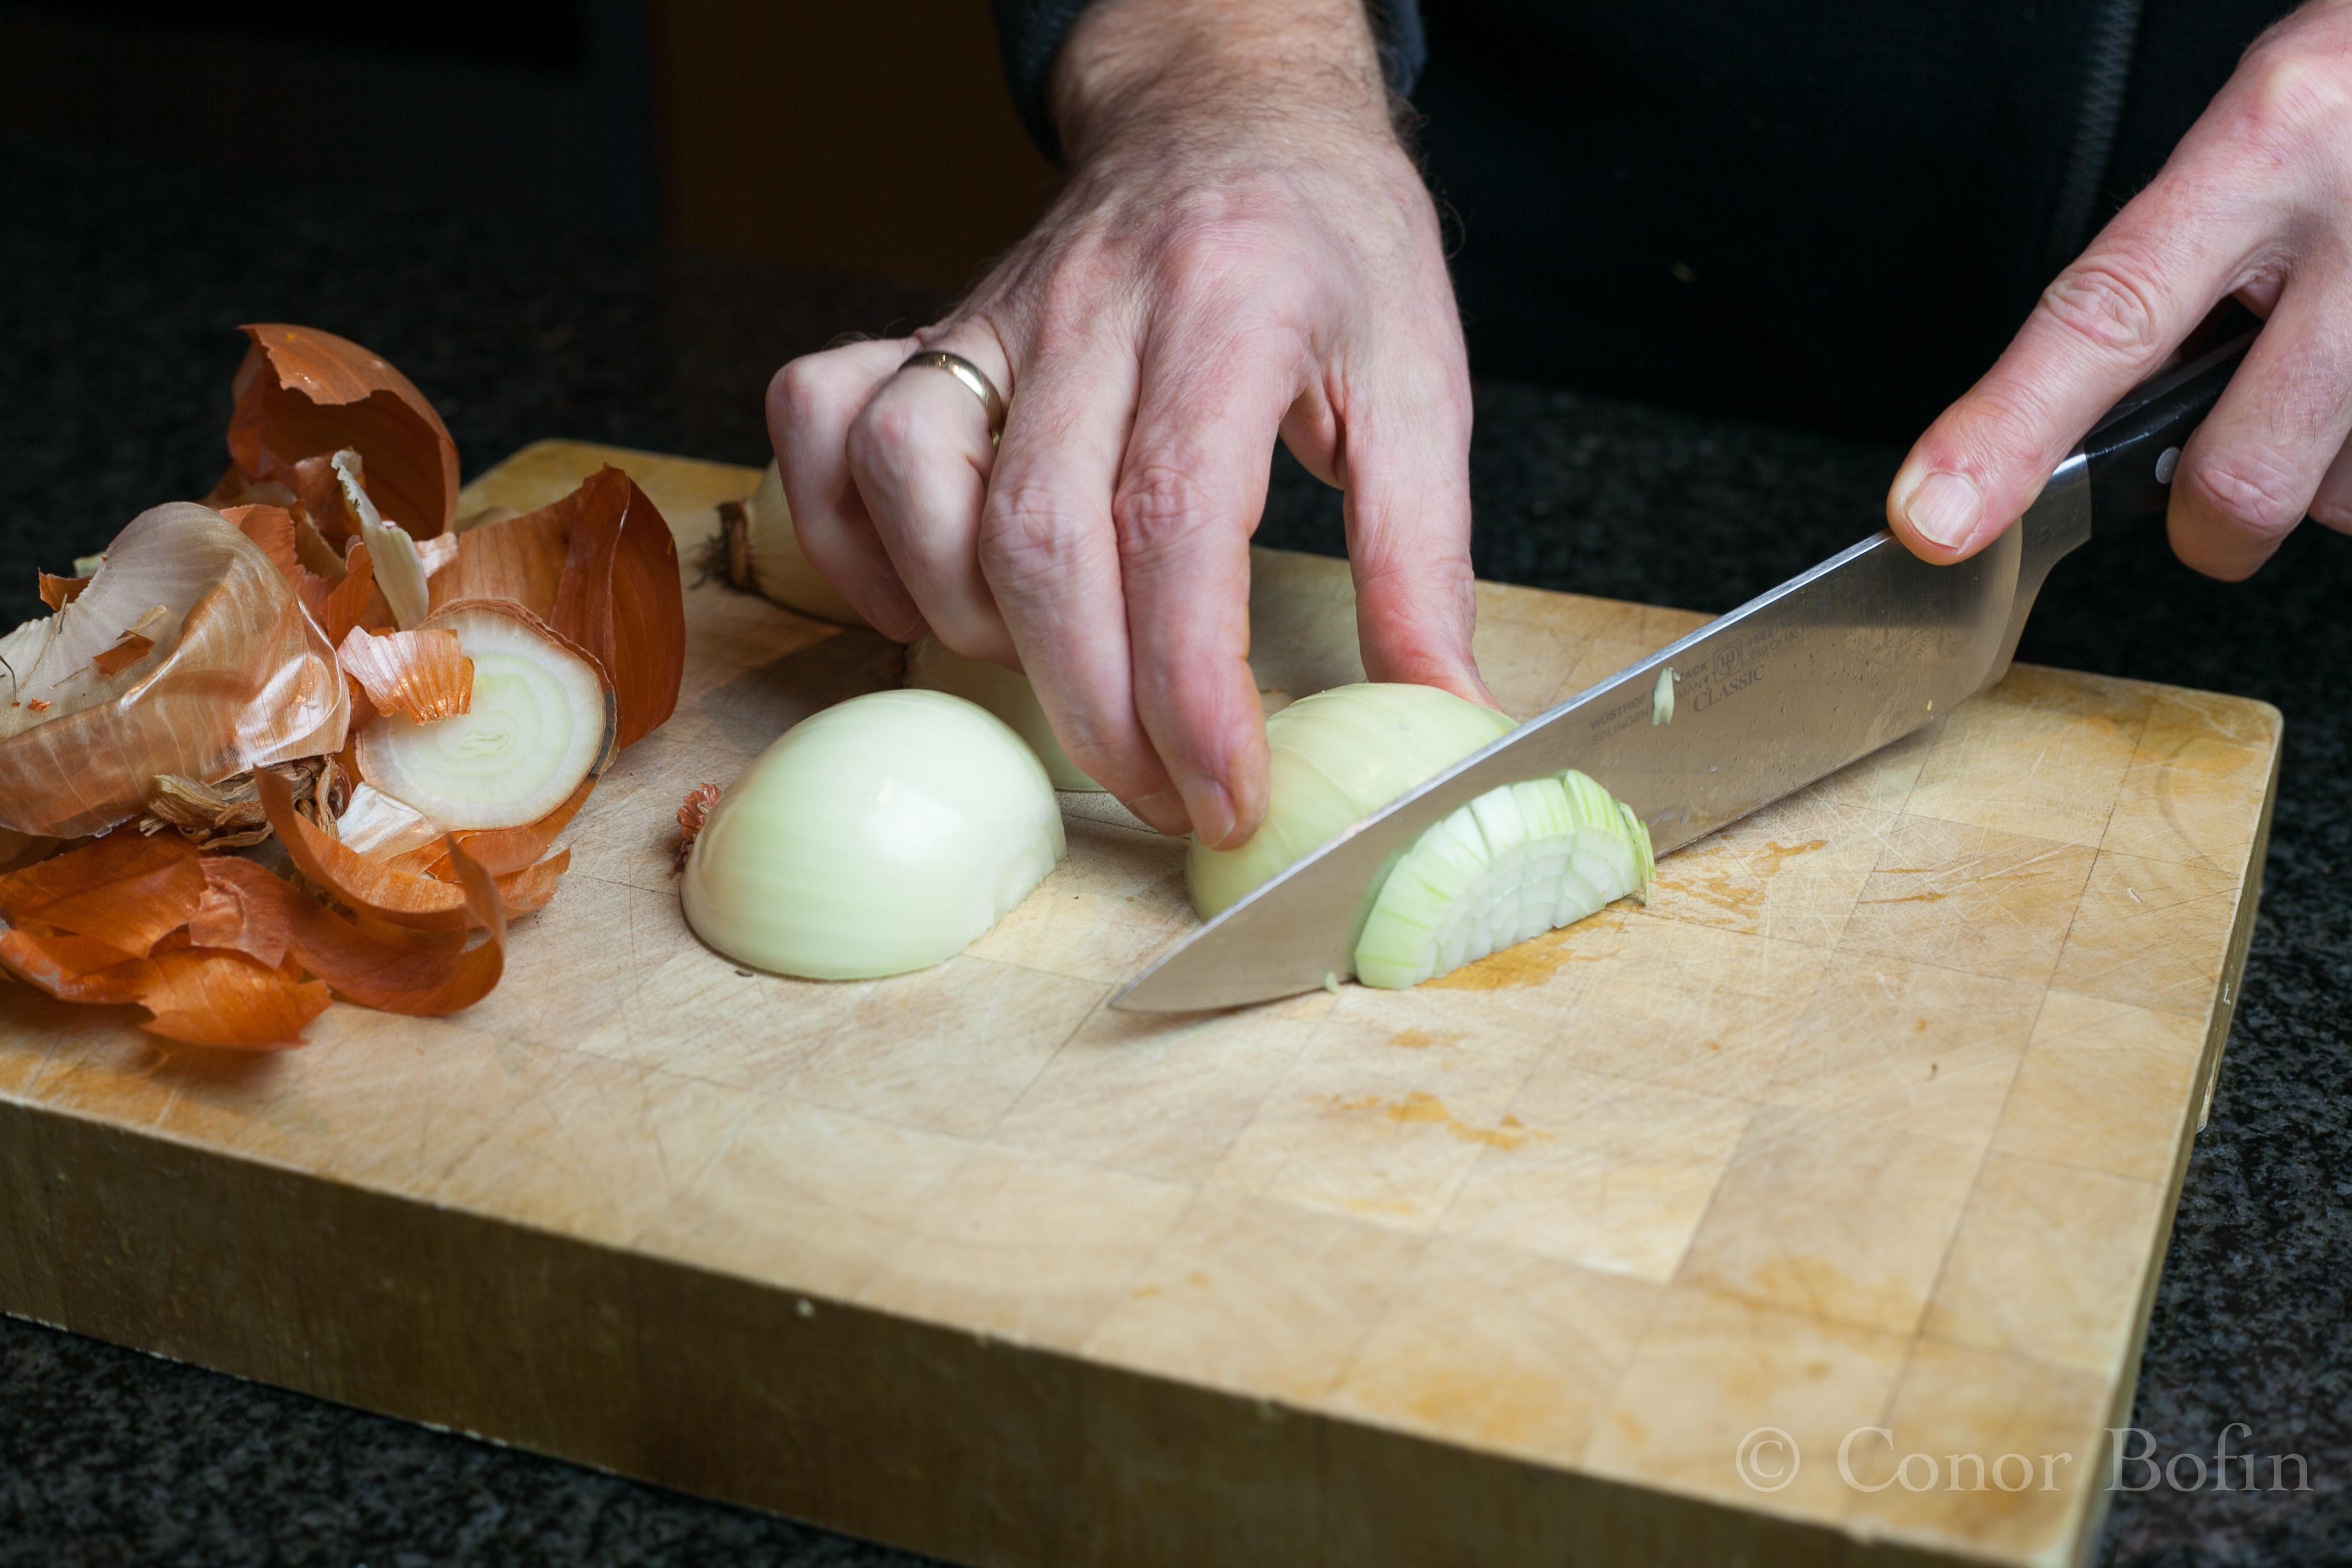 Cutting an onion